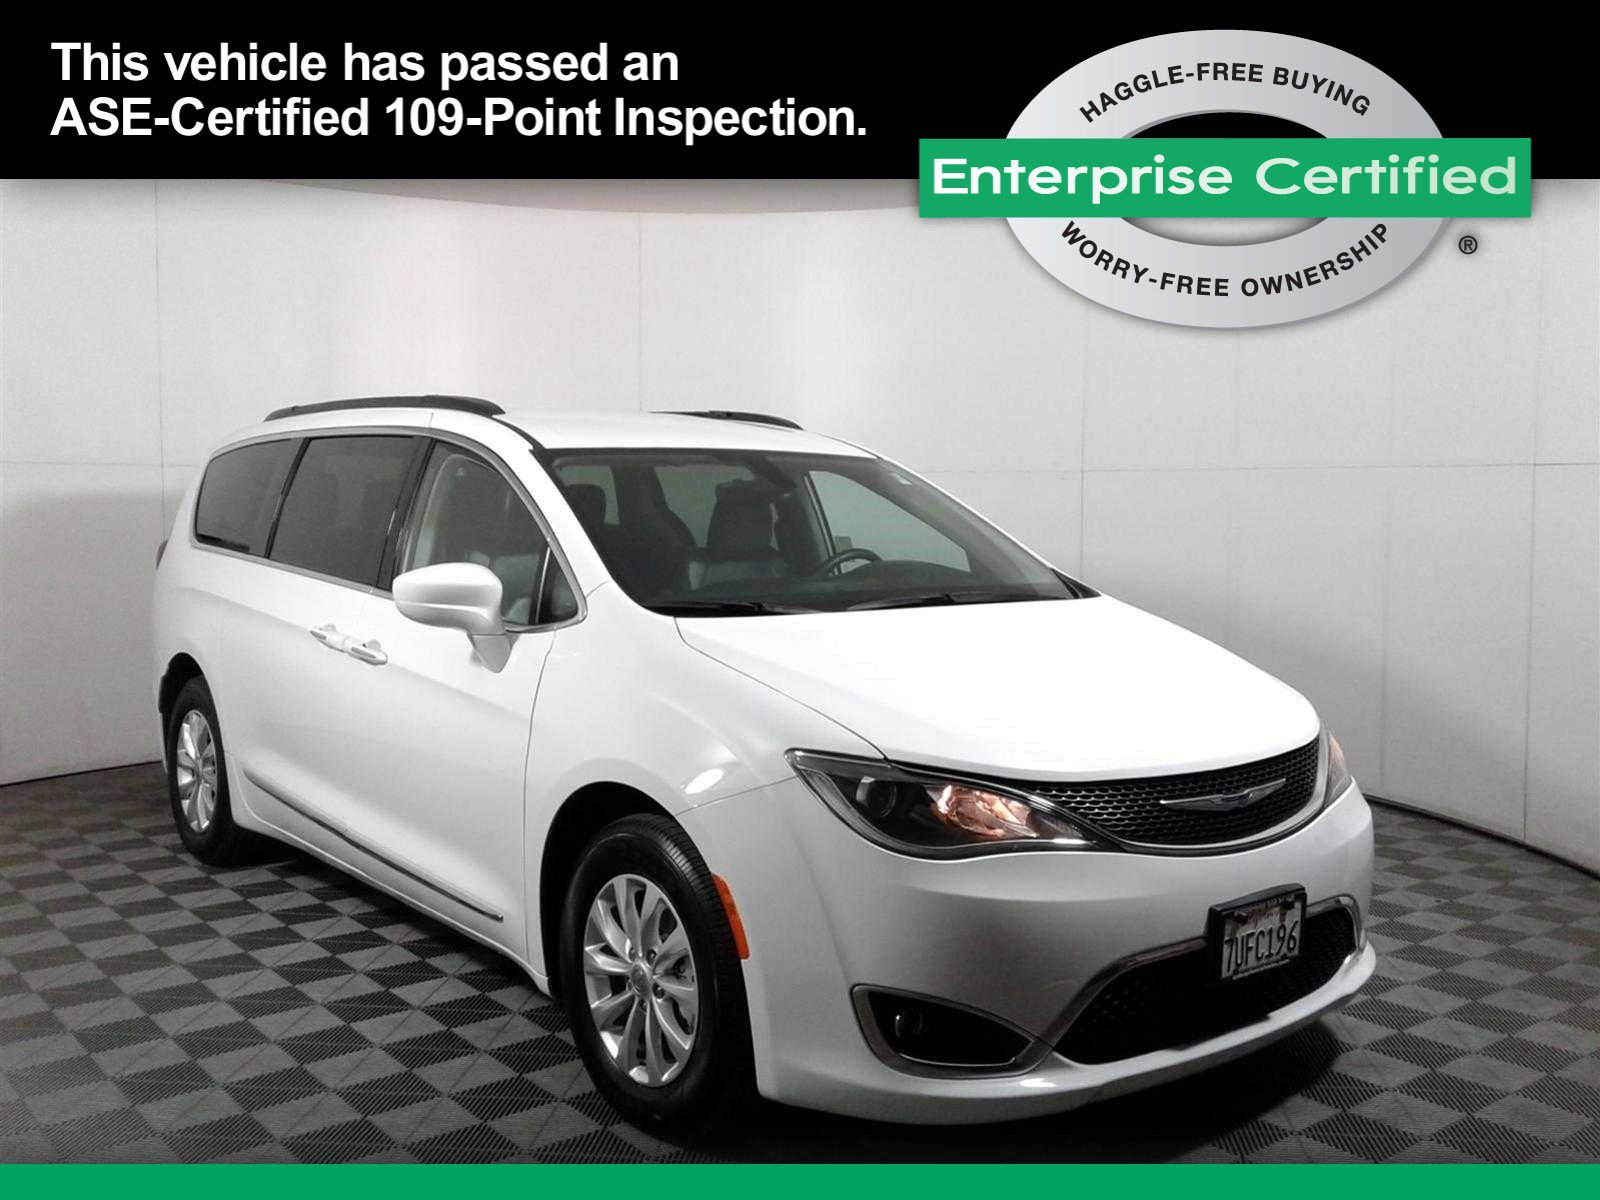 Location: Sunnyvale, CA2017 Chrysler Pacifica Touring-L in Sunnyvale, CA